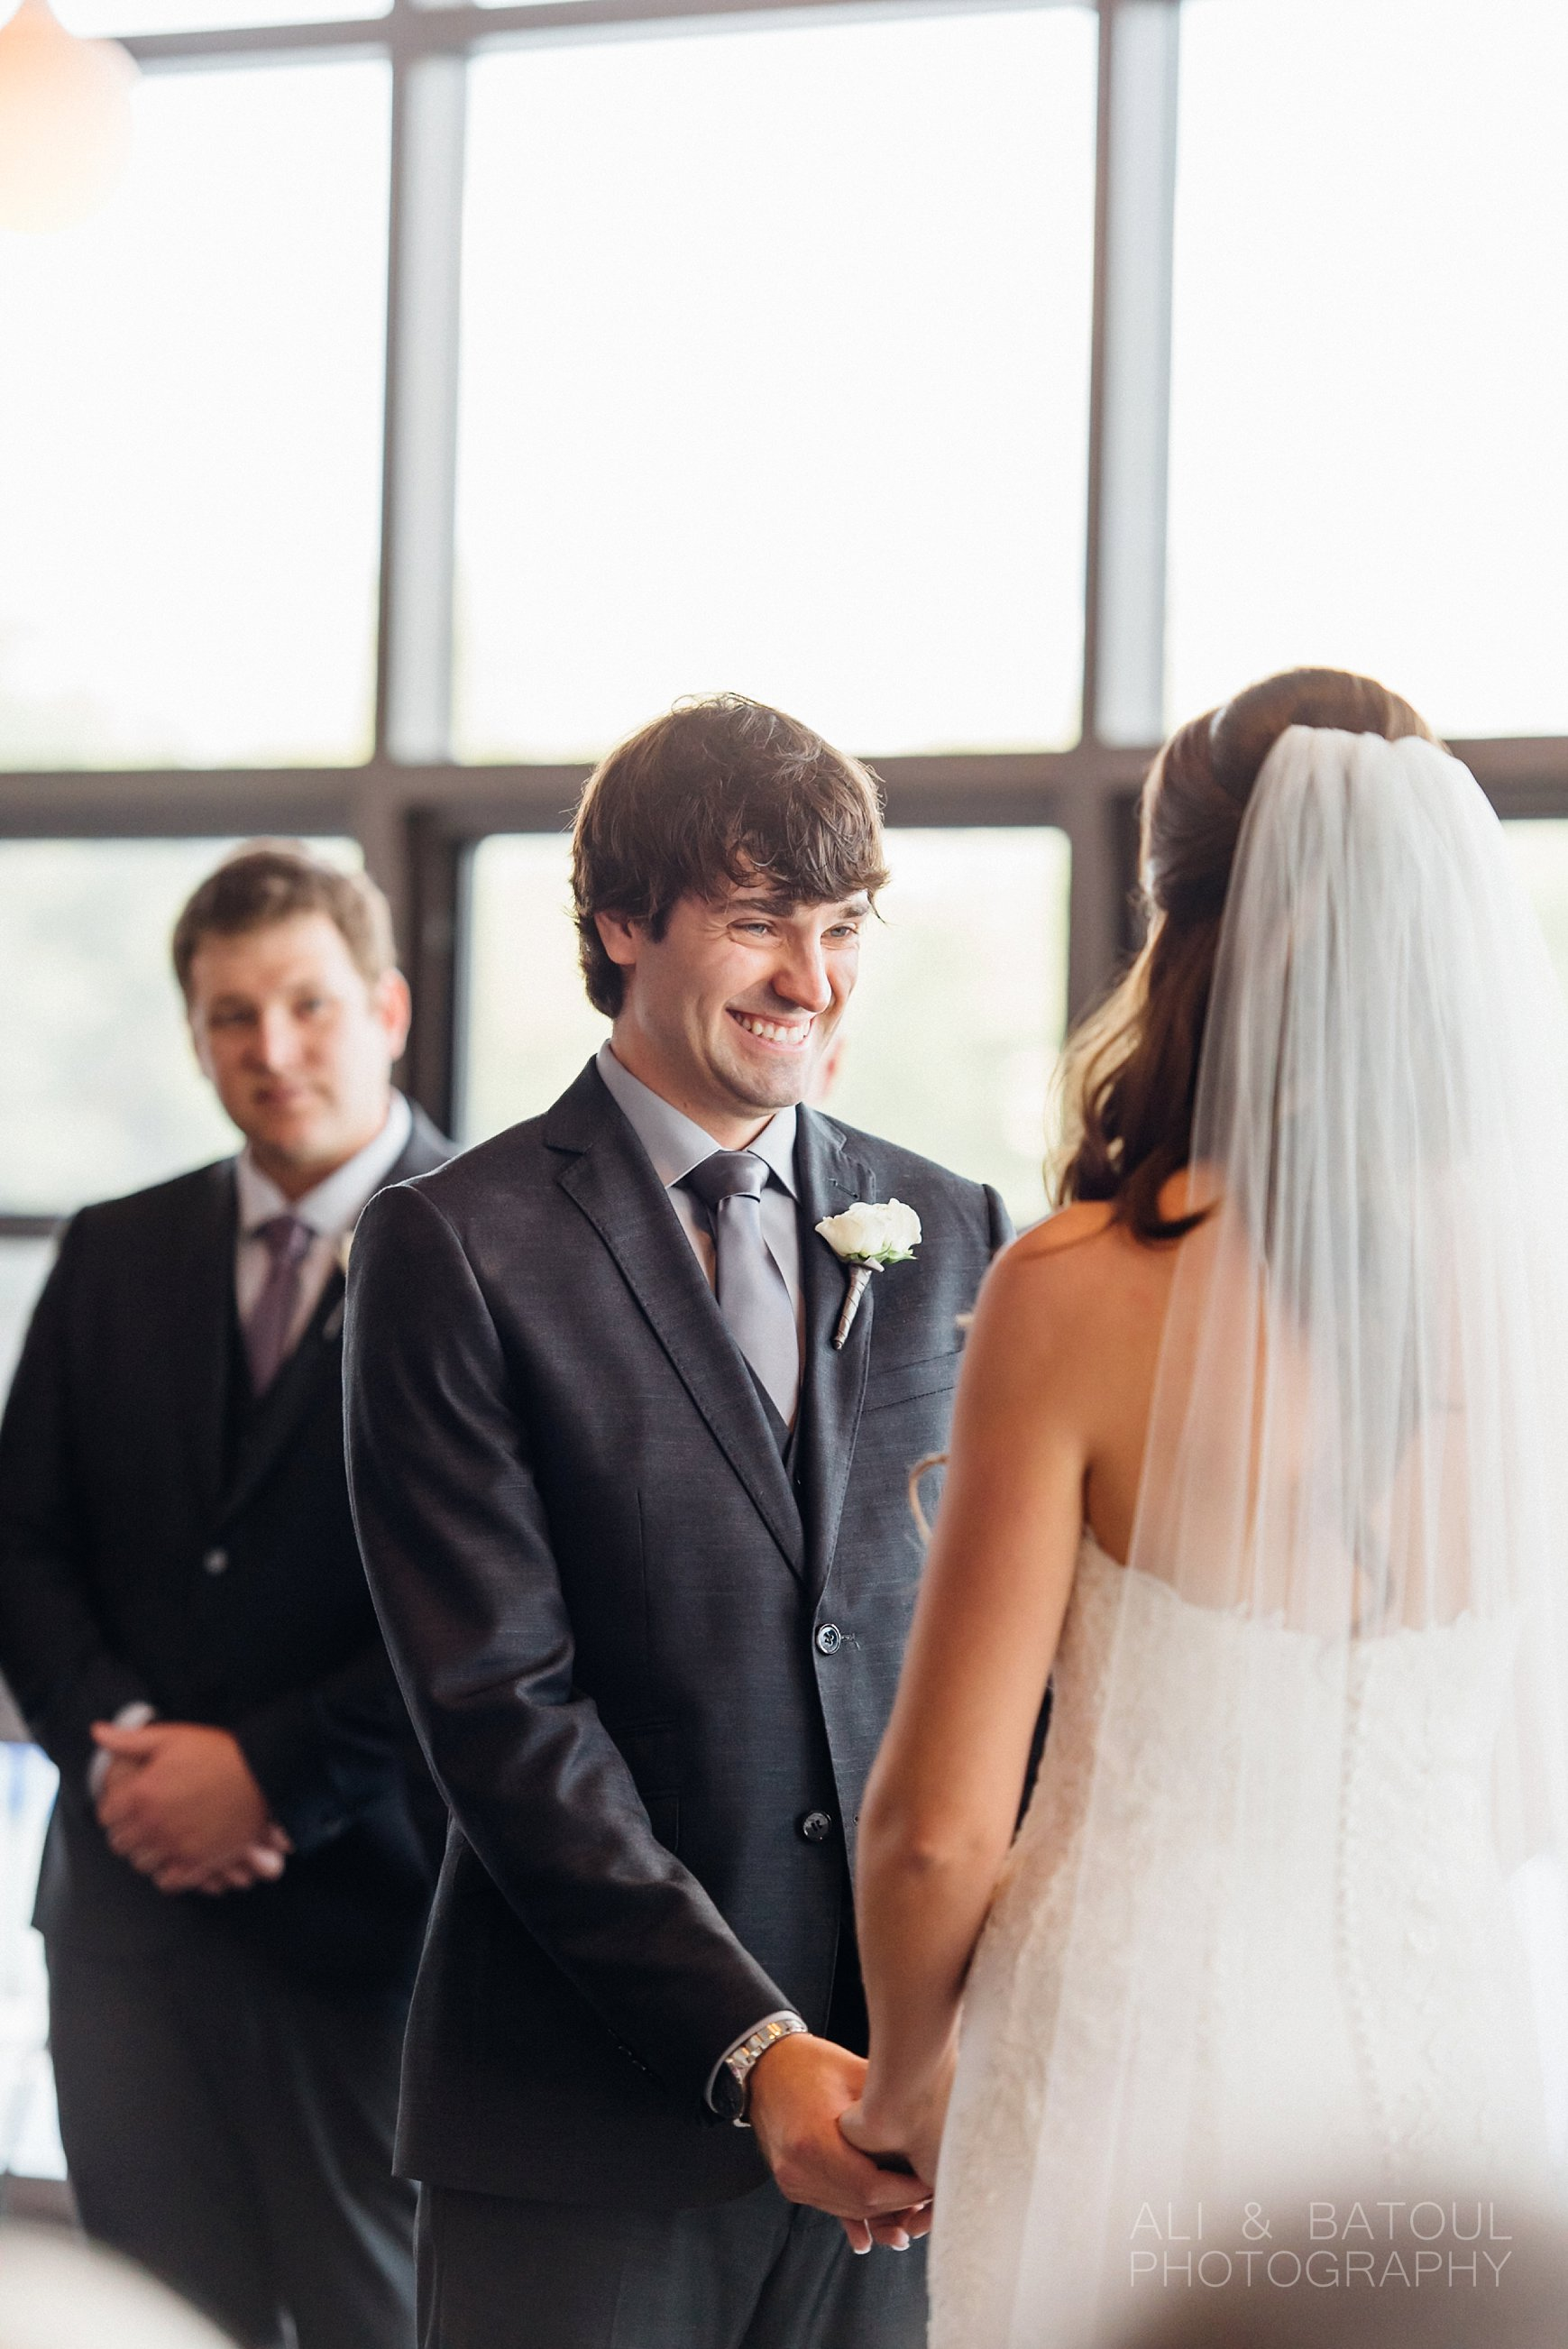 Ali & Batoul Photography - Documentary Fine Art Ottawa Wedding Photography_0032.jpg